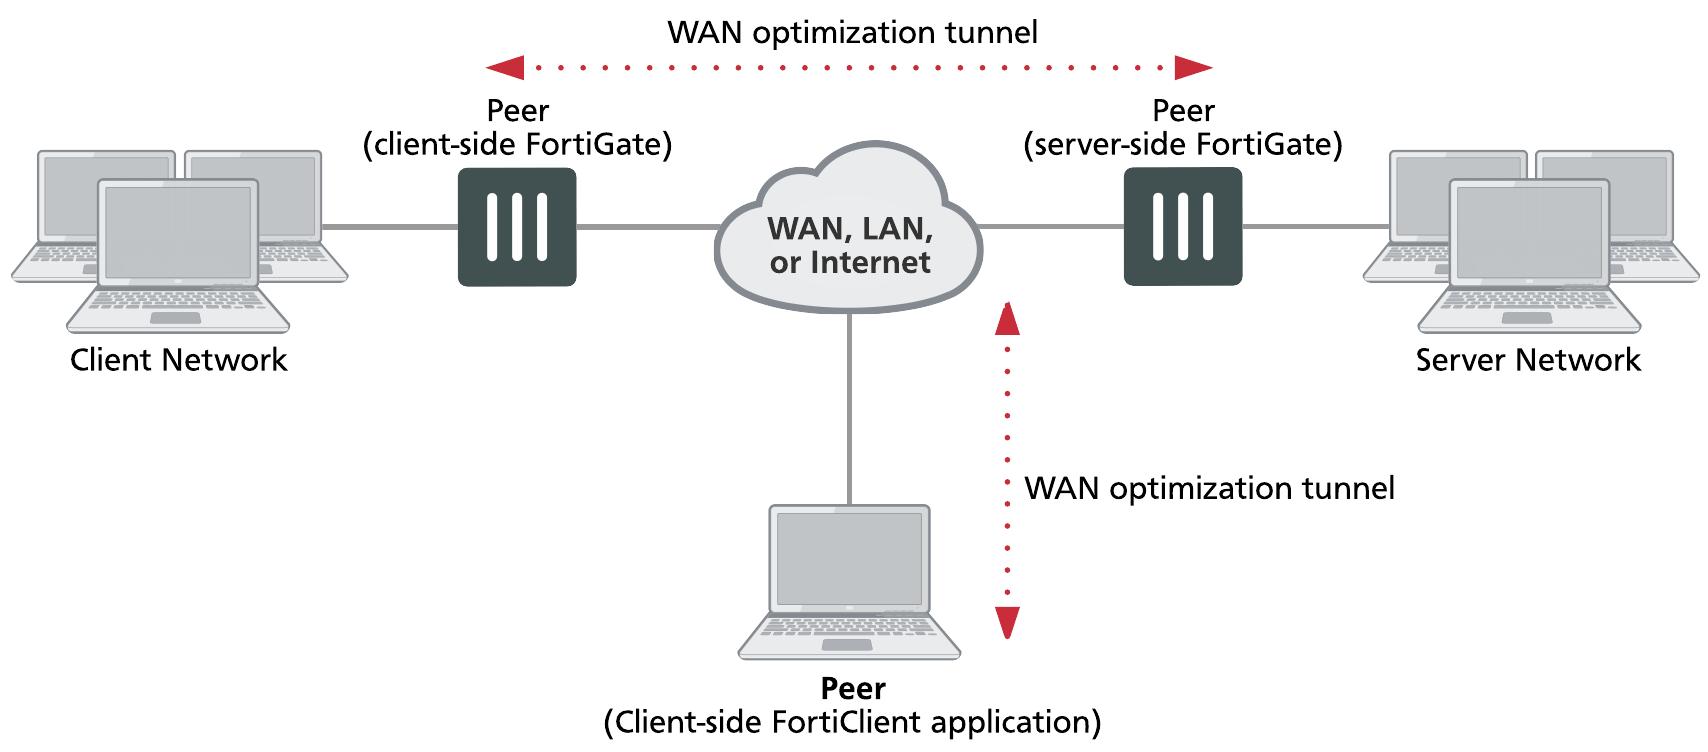 Configuring WAN optimization